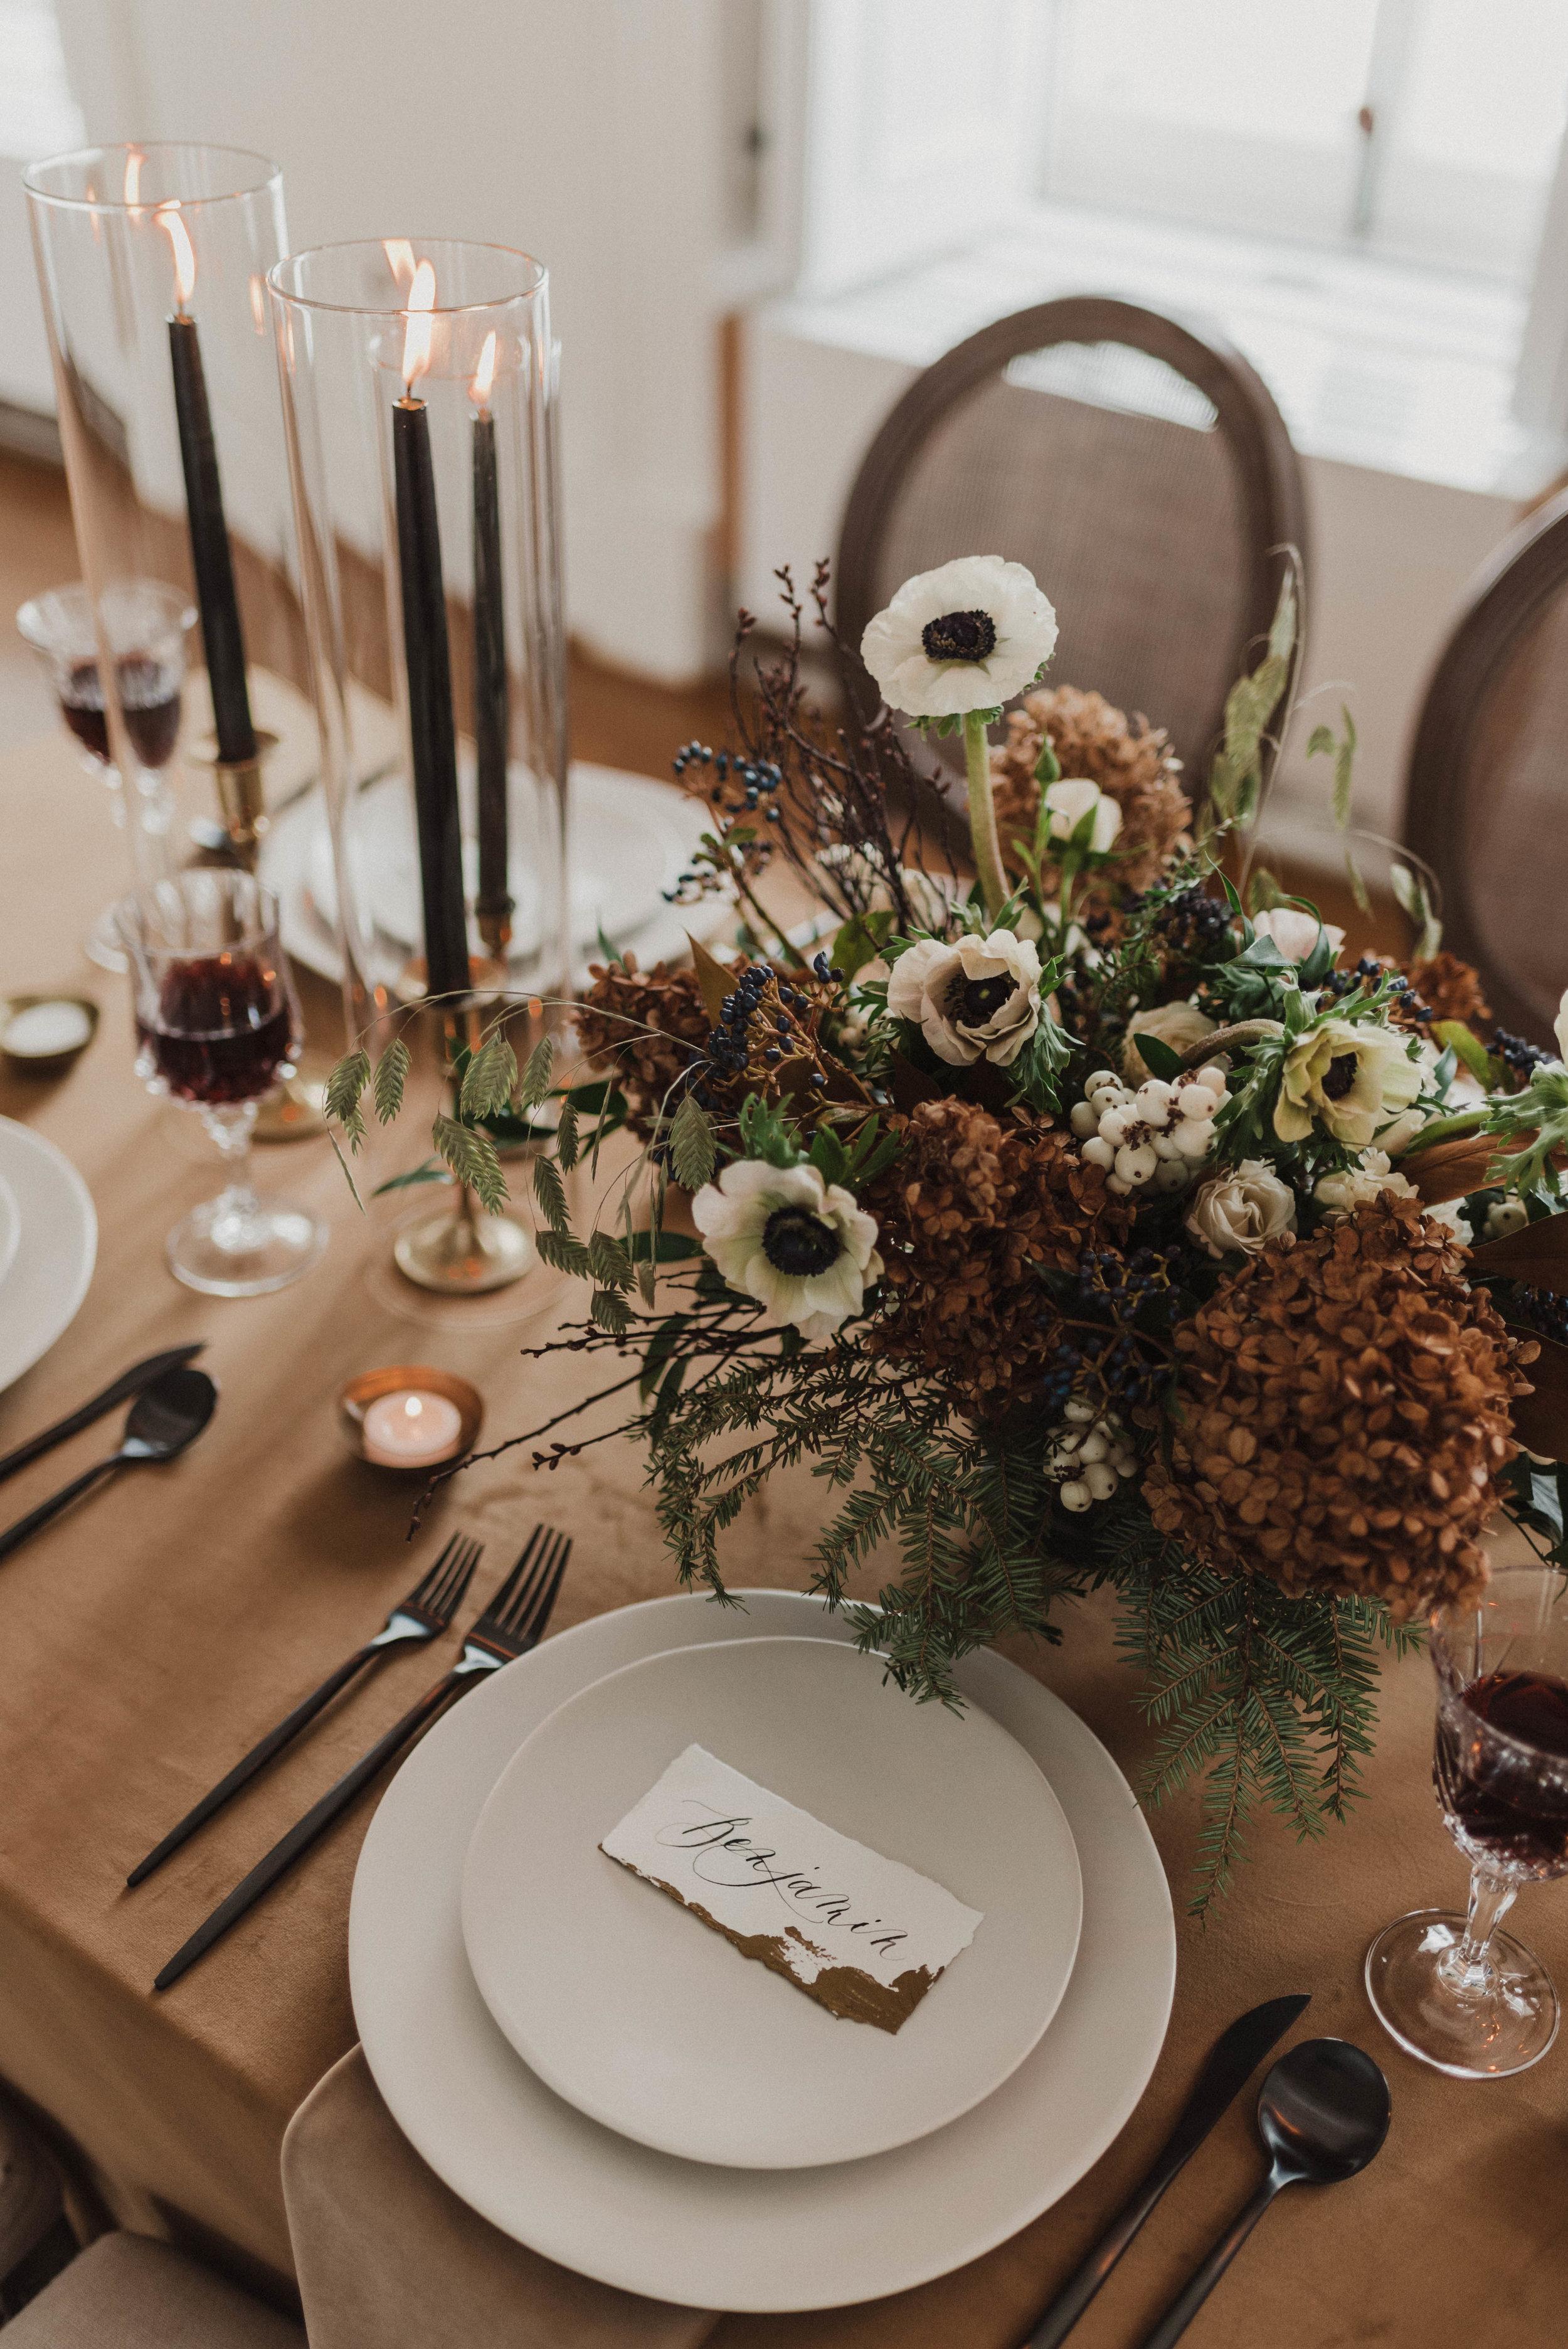 Wedding reception dinner table setting.